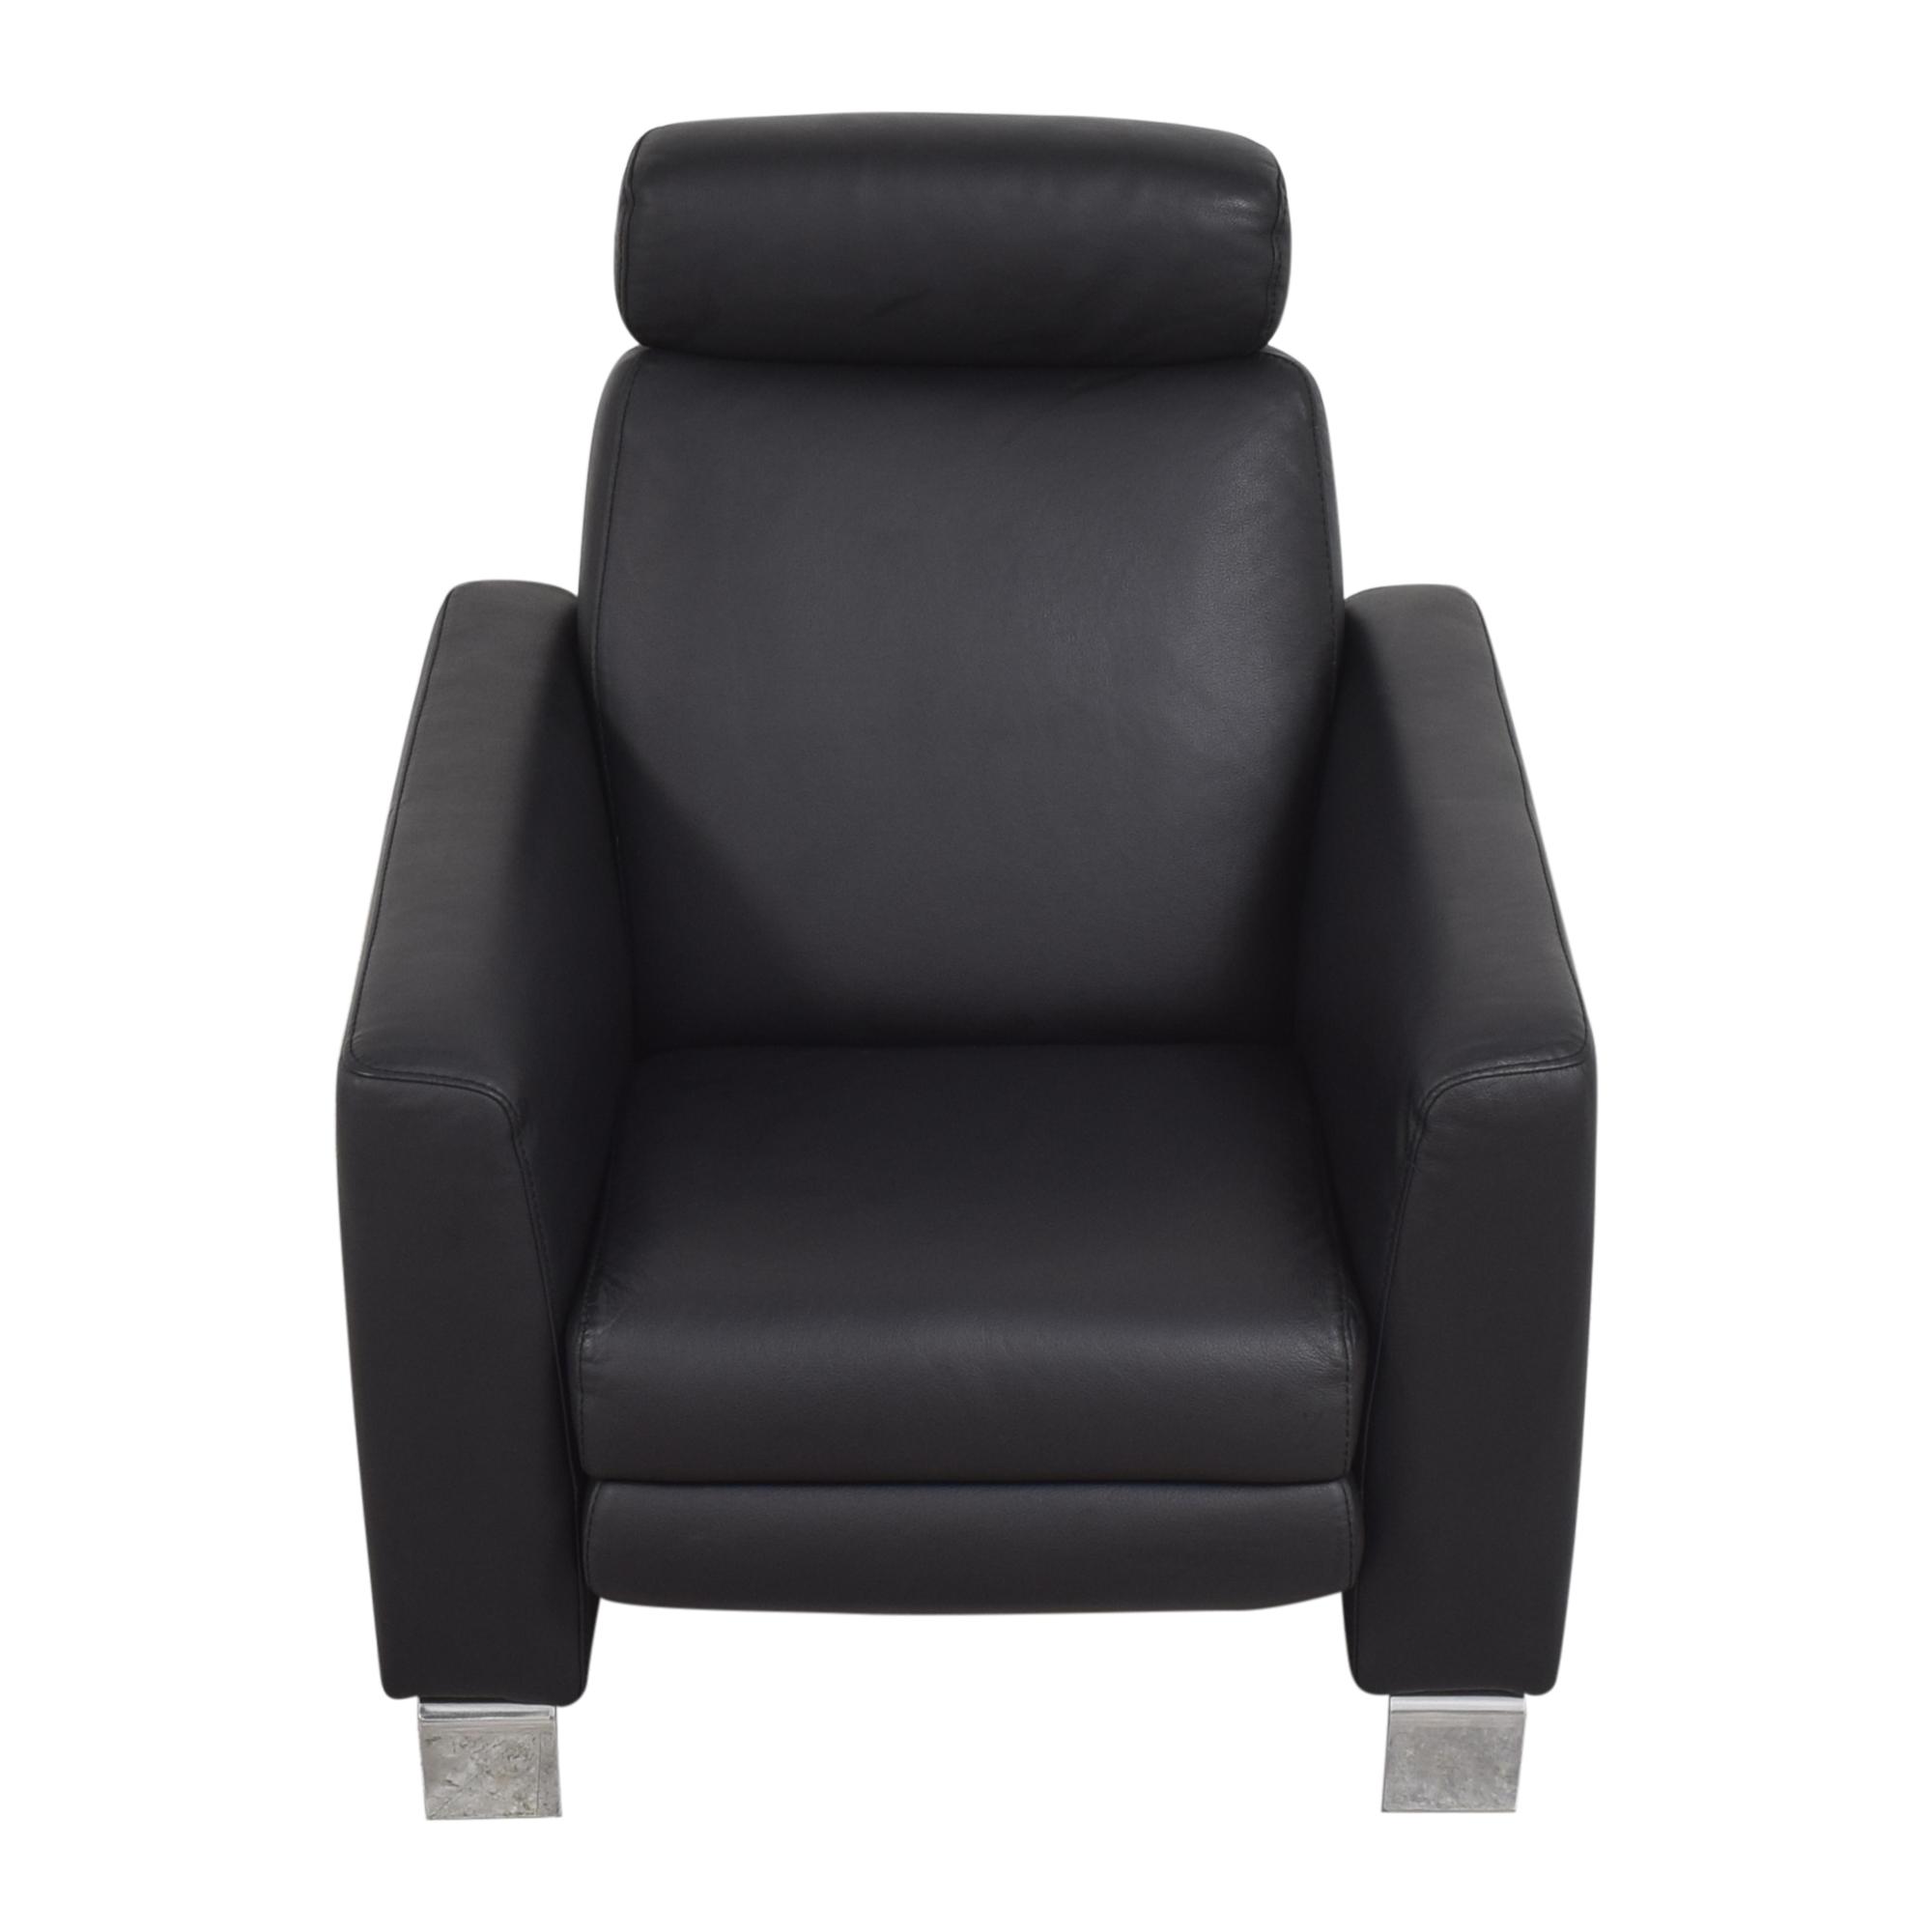 Modern Reclining Armchair / Chairs